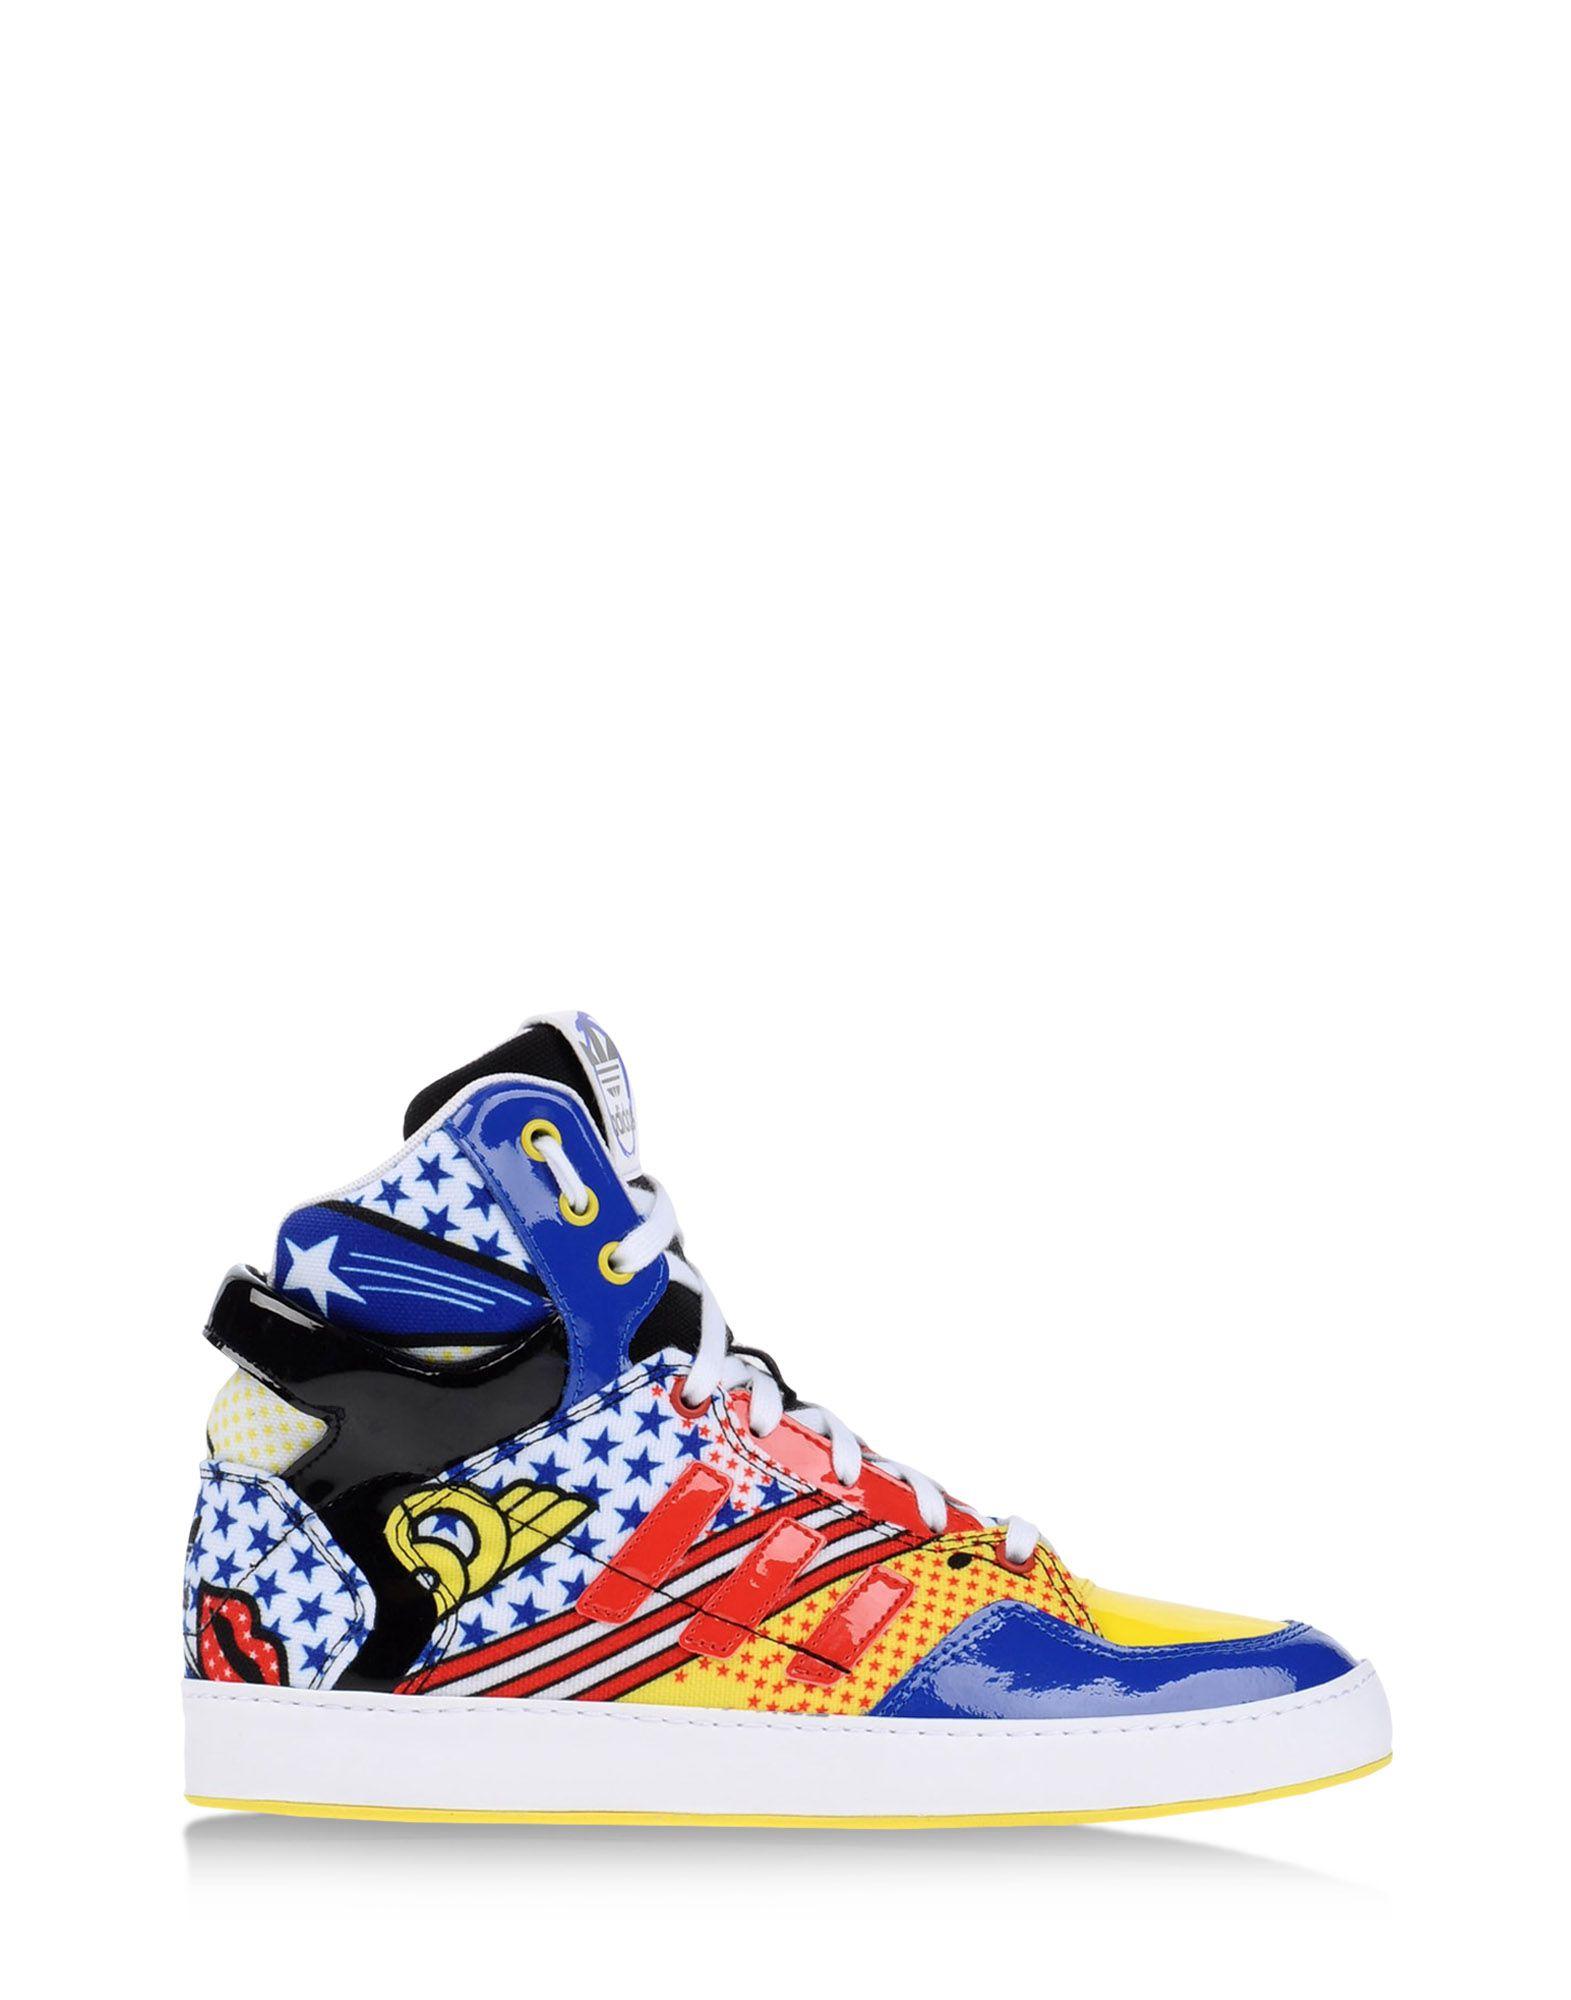 Rita Ora Adidas Shoes